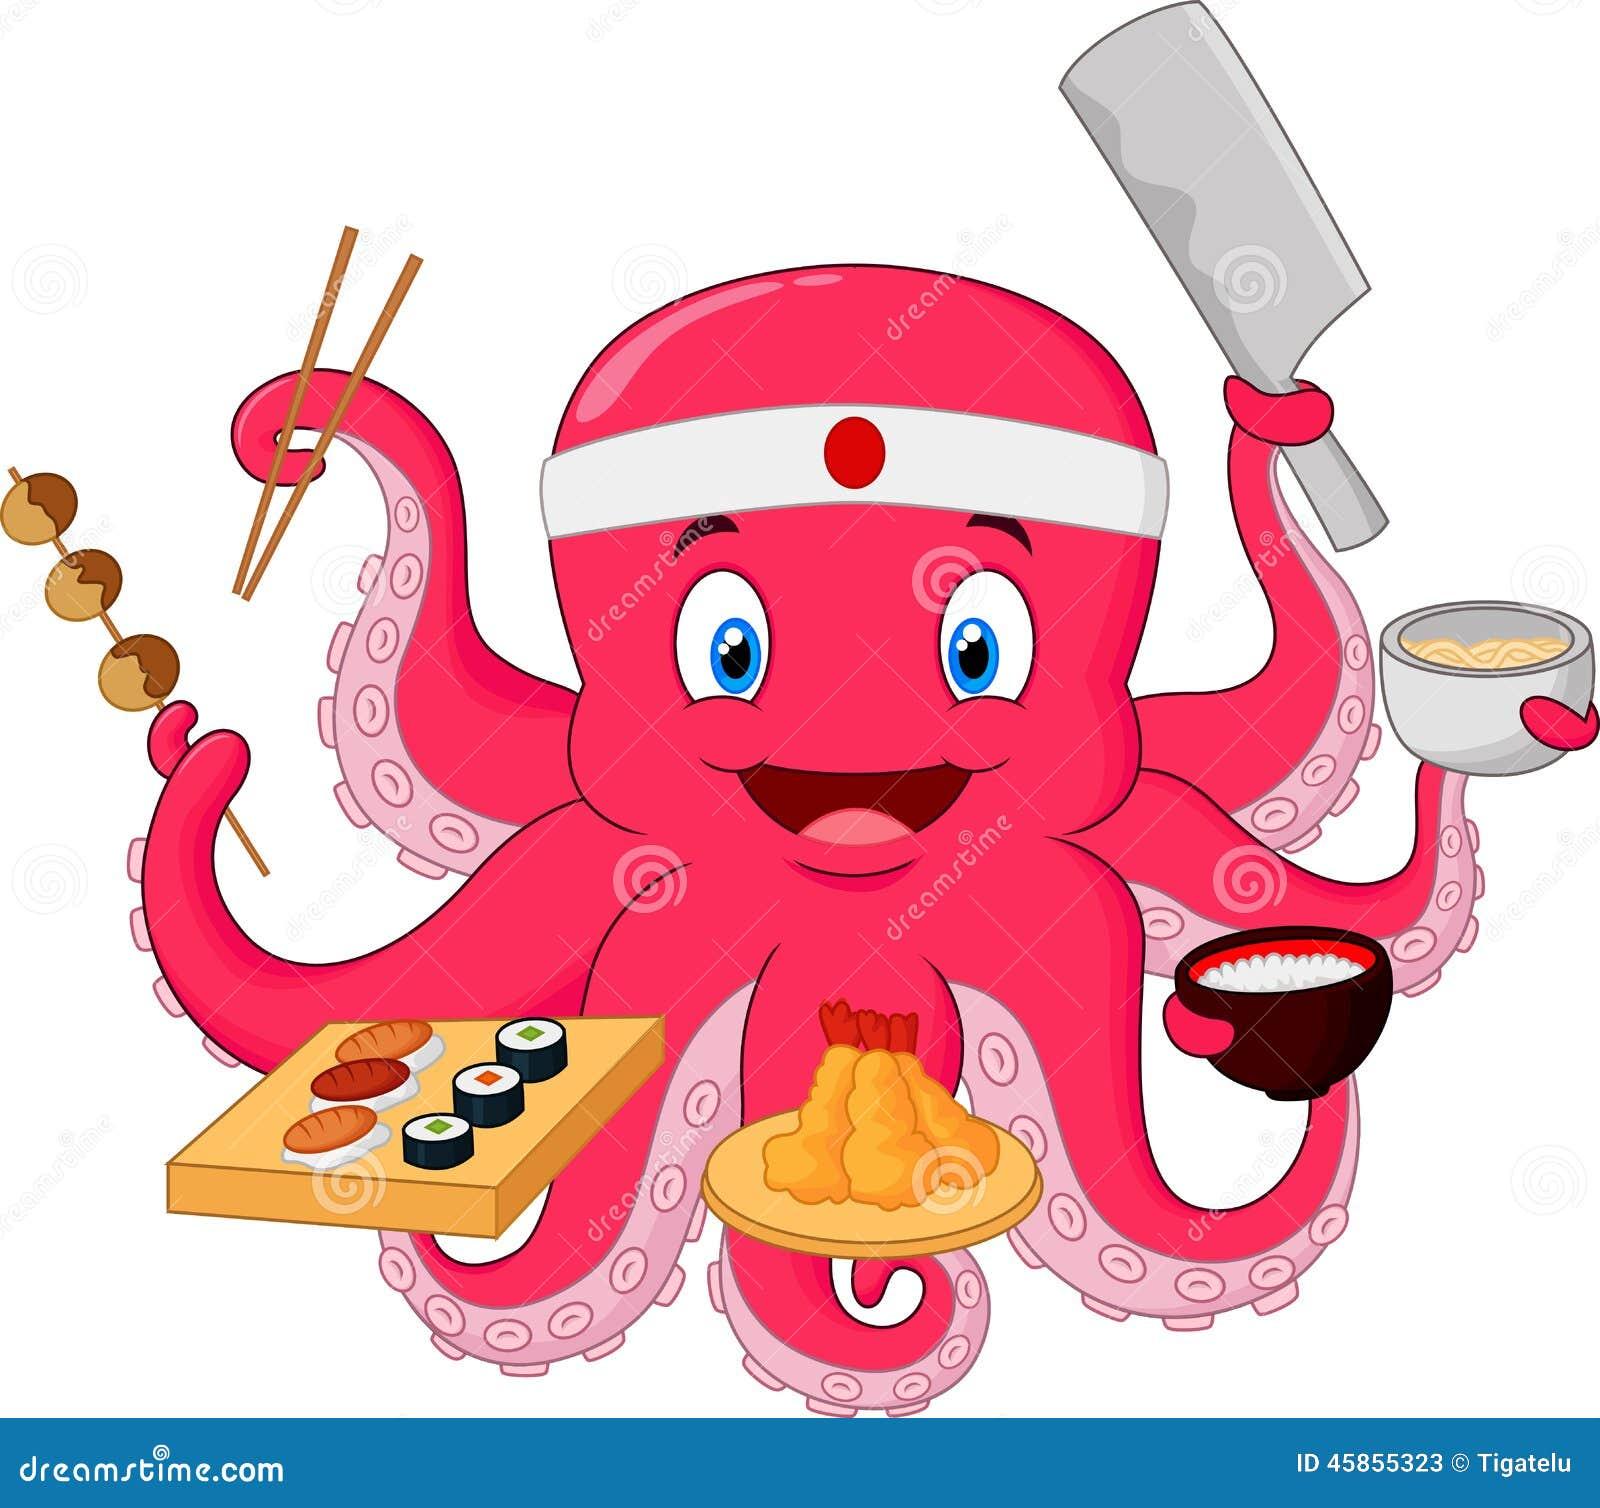 Cartoon Octopus Chef Stock Vector - Image: 45855323